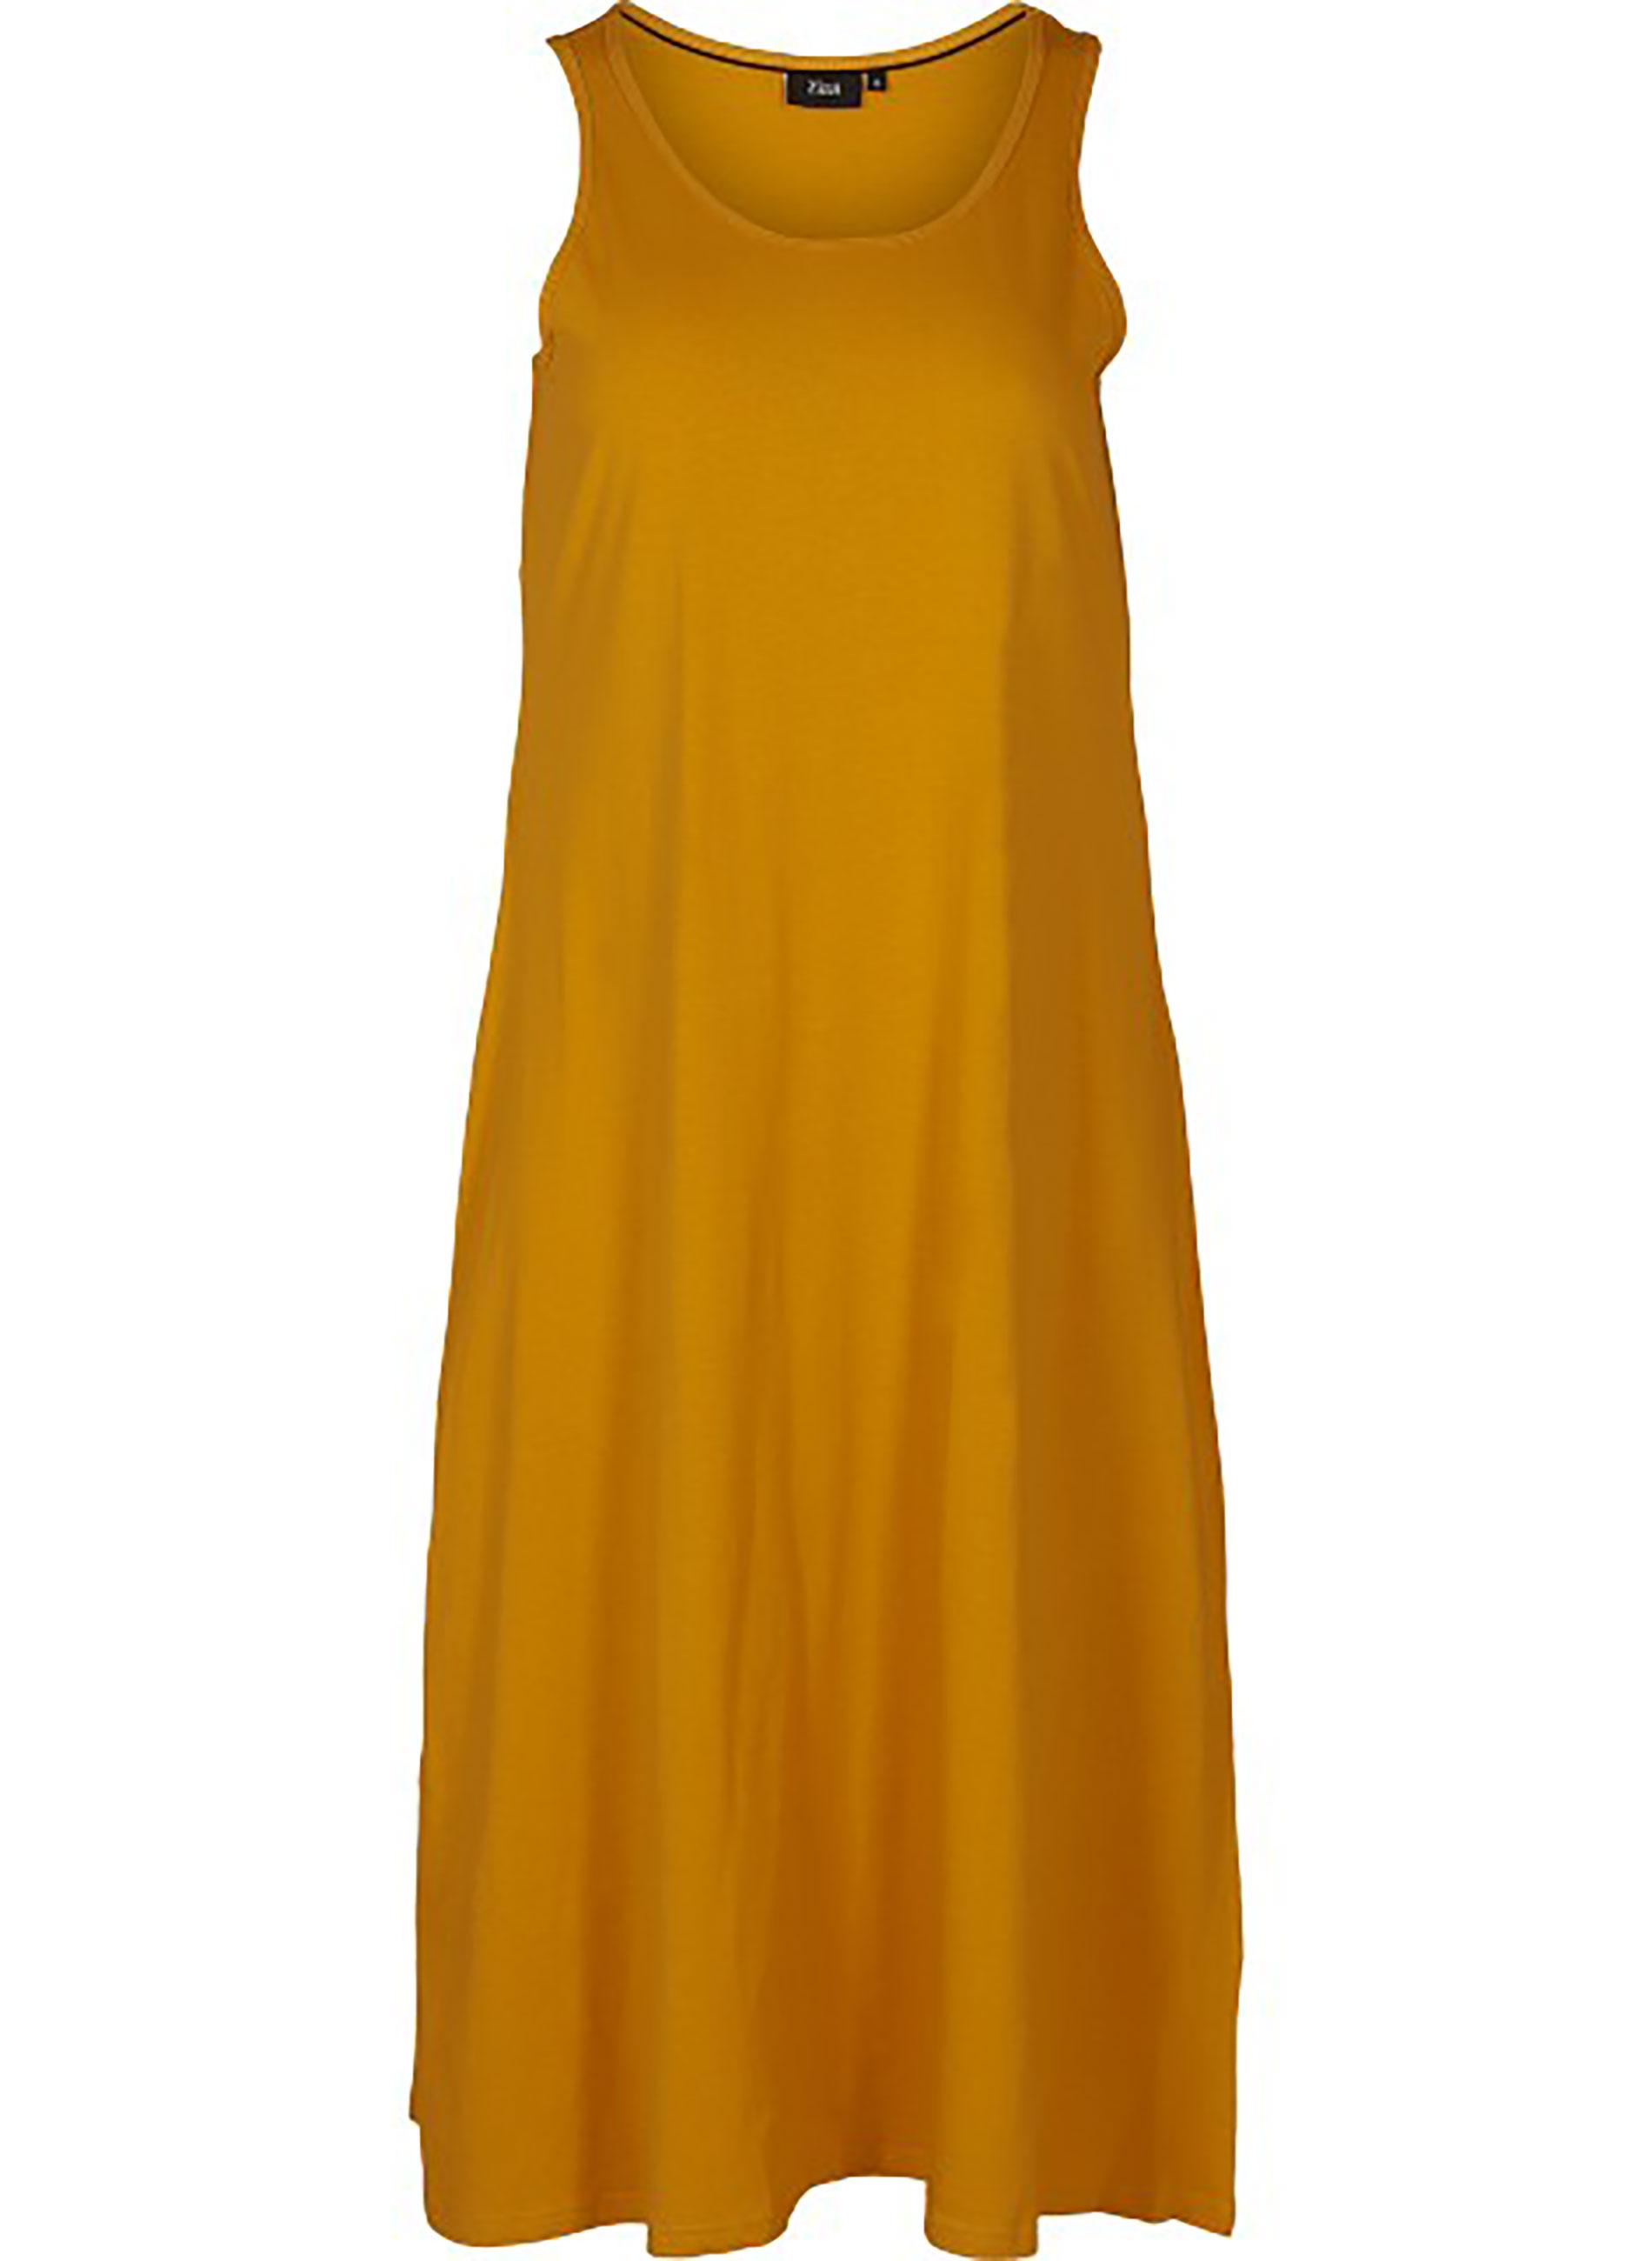 6f5b0206b154 ΜΕΓΑΛΑ ΜΕΓΕΘΗ ΦΟΡΕΜΑΤΑ    Φόρεμα Μάξι Κροκί Βαμβακερό - Μόδα σε ...